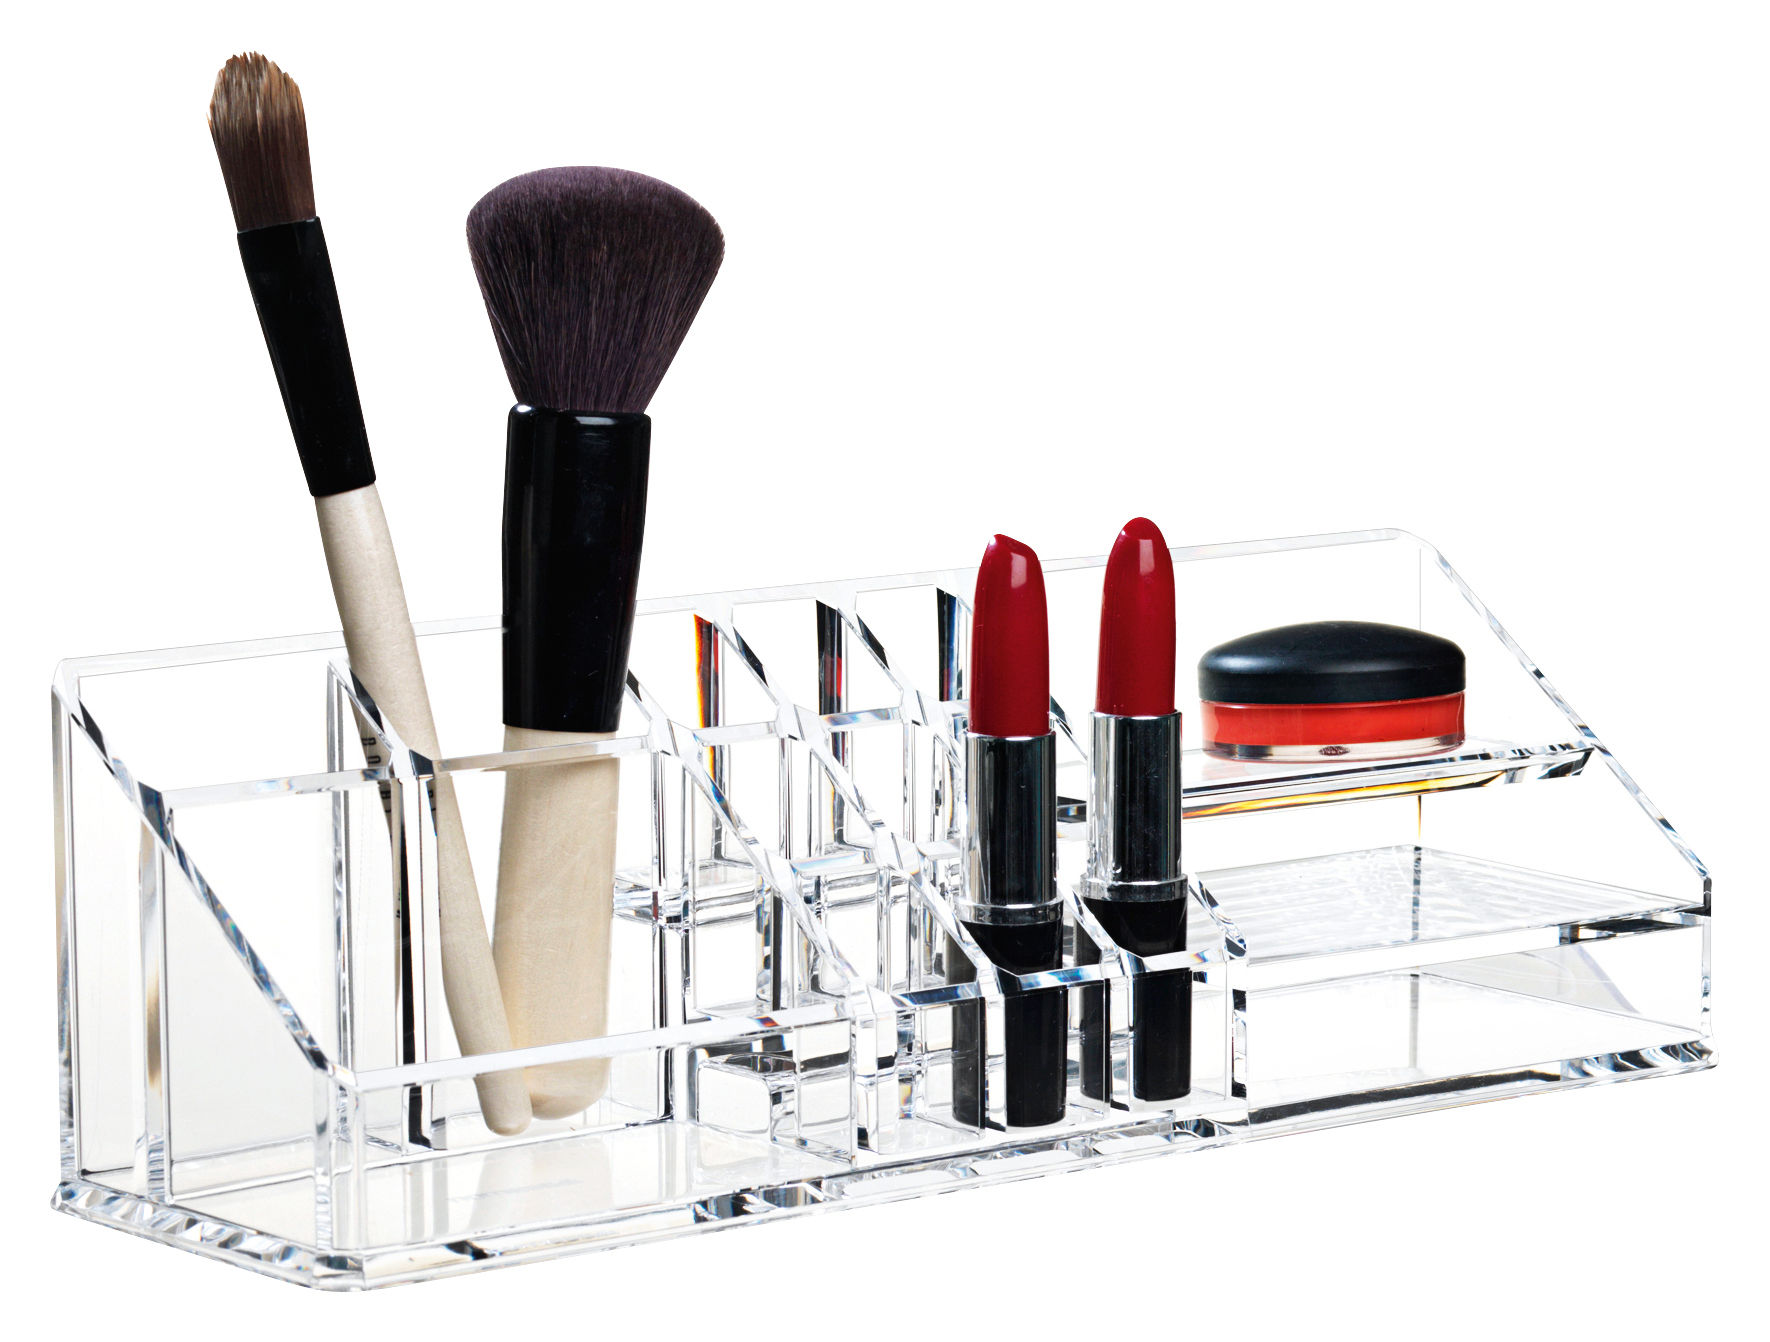 Bo te maquillage clear organisateur de bureau - Organisateur de maquillage ...